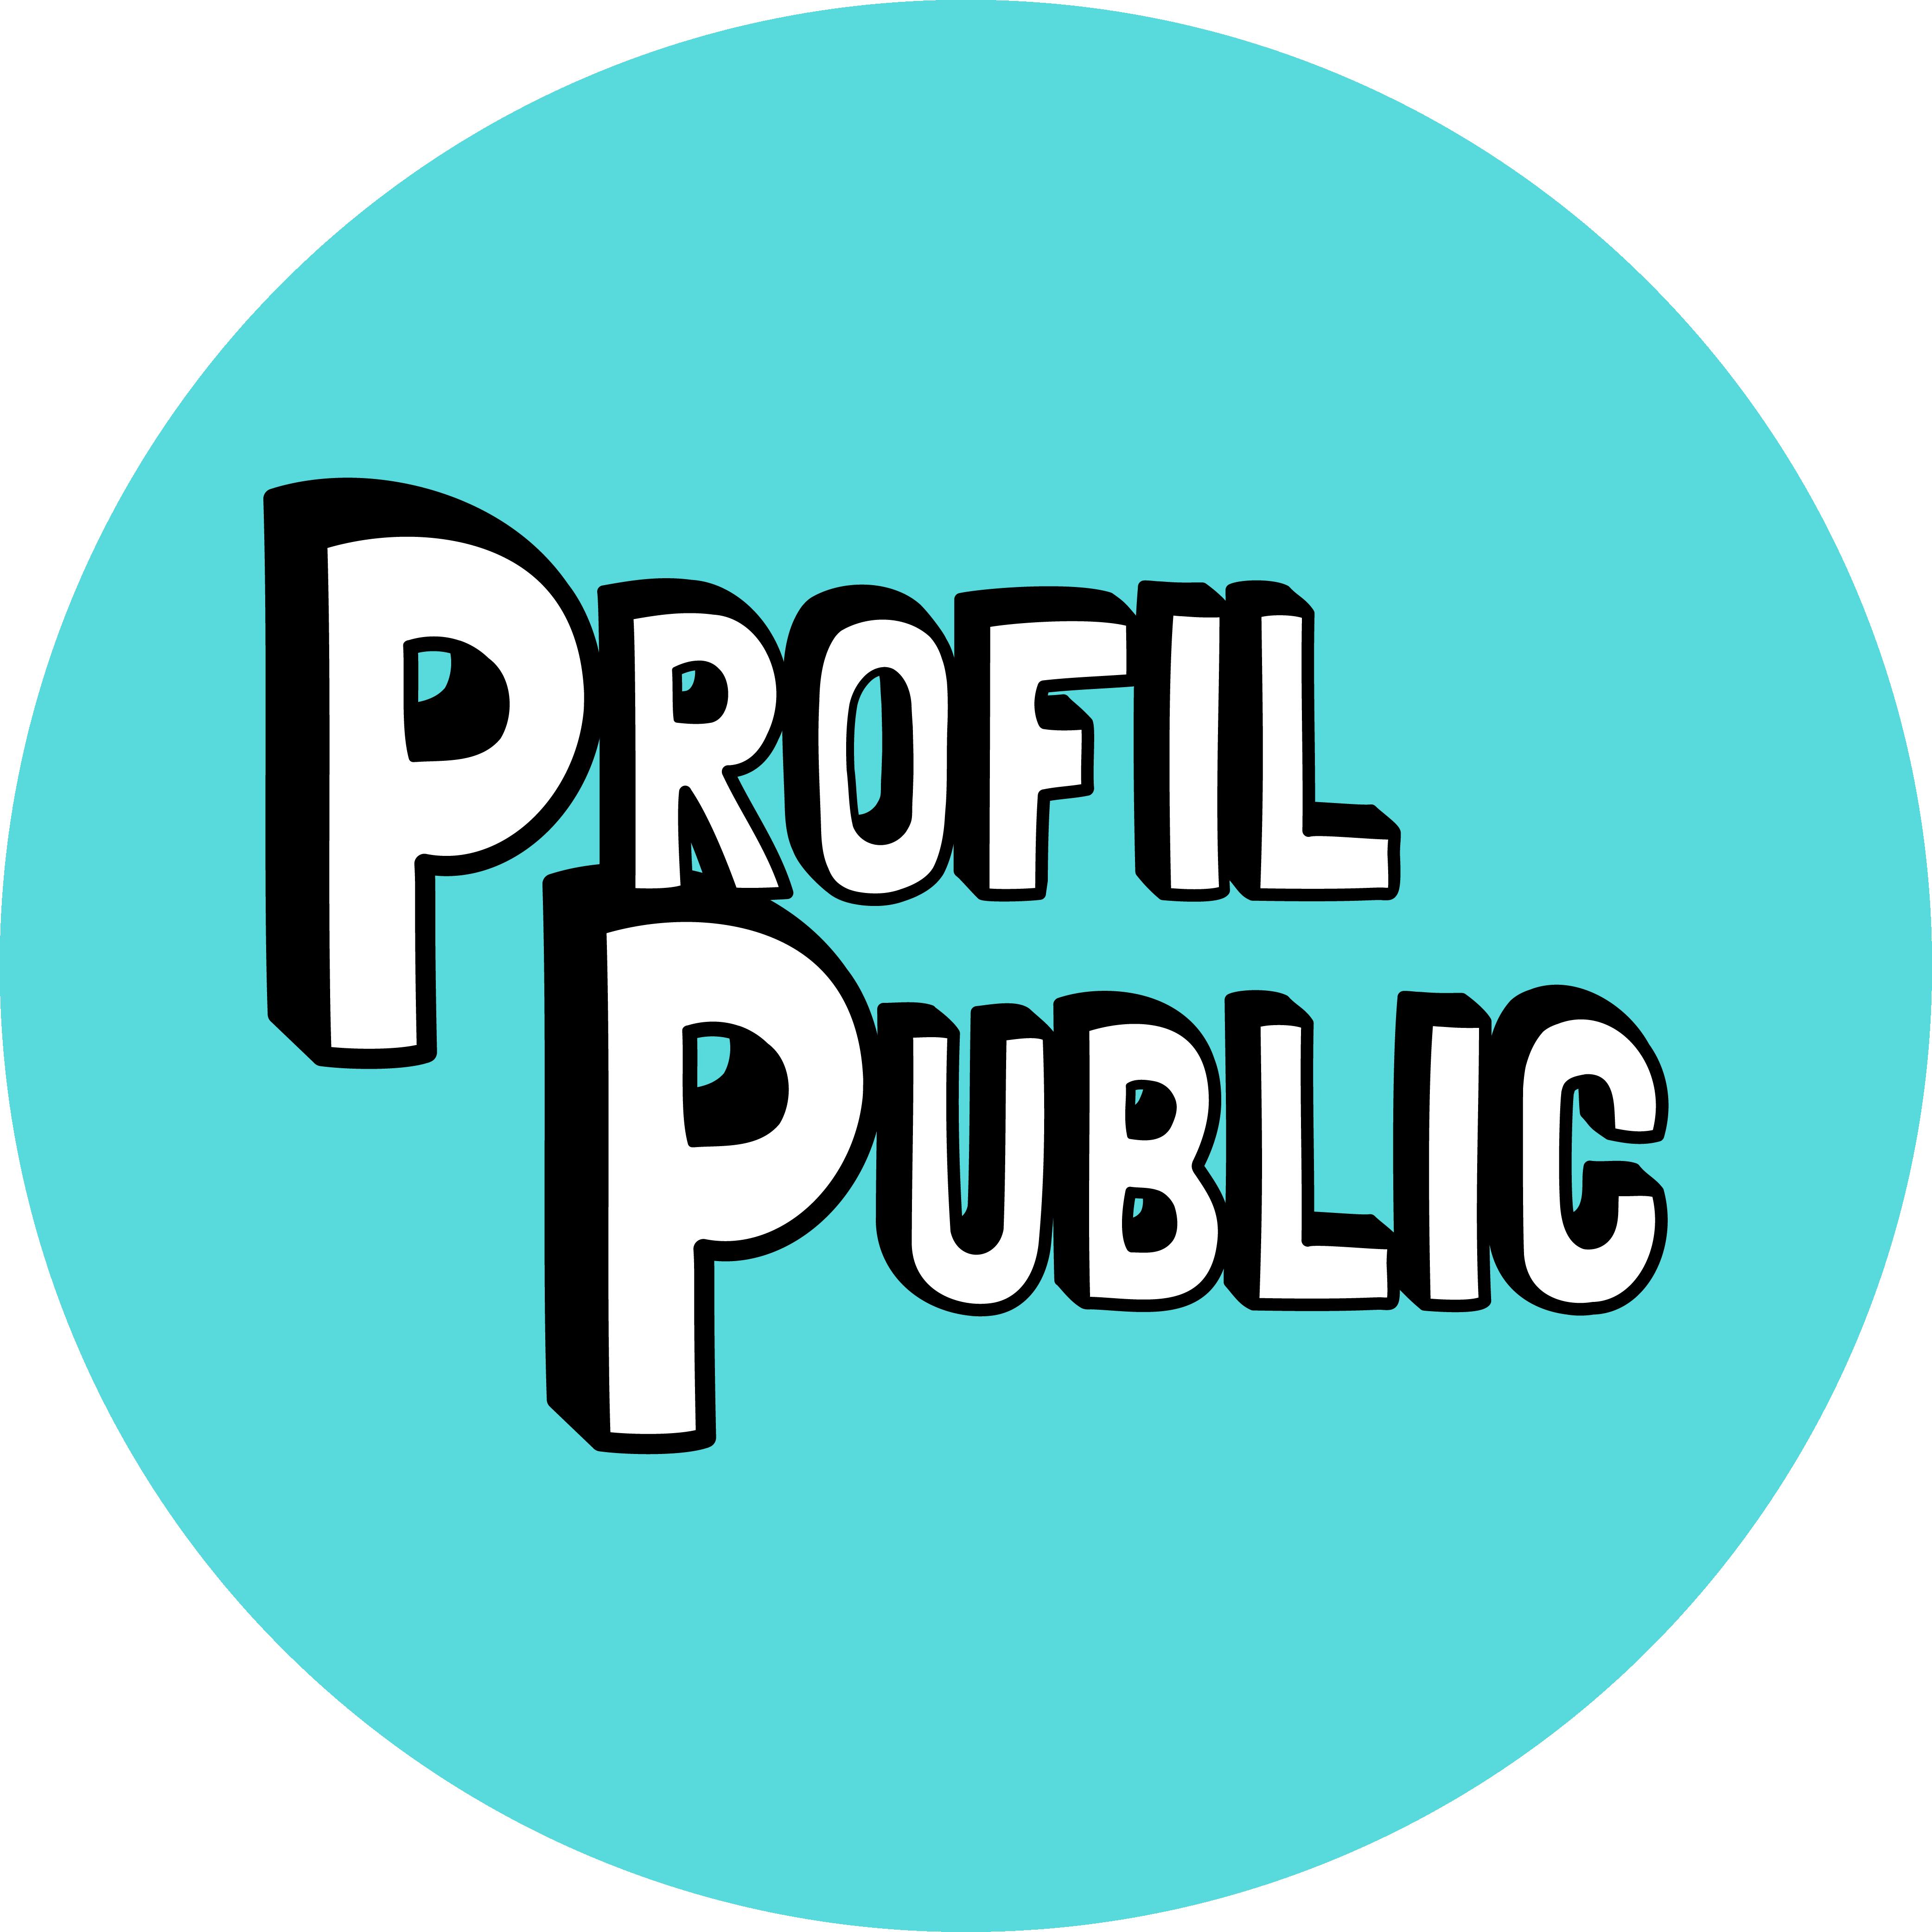 Logo de Profil public (www.profilpublic.fr)